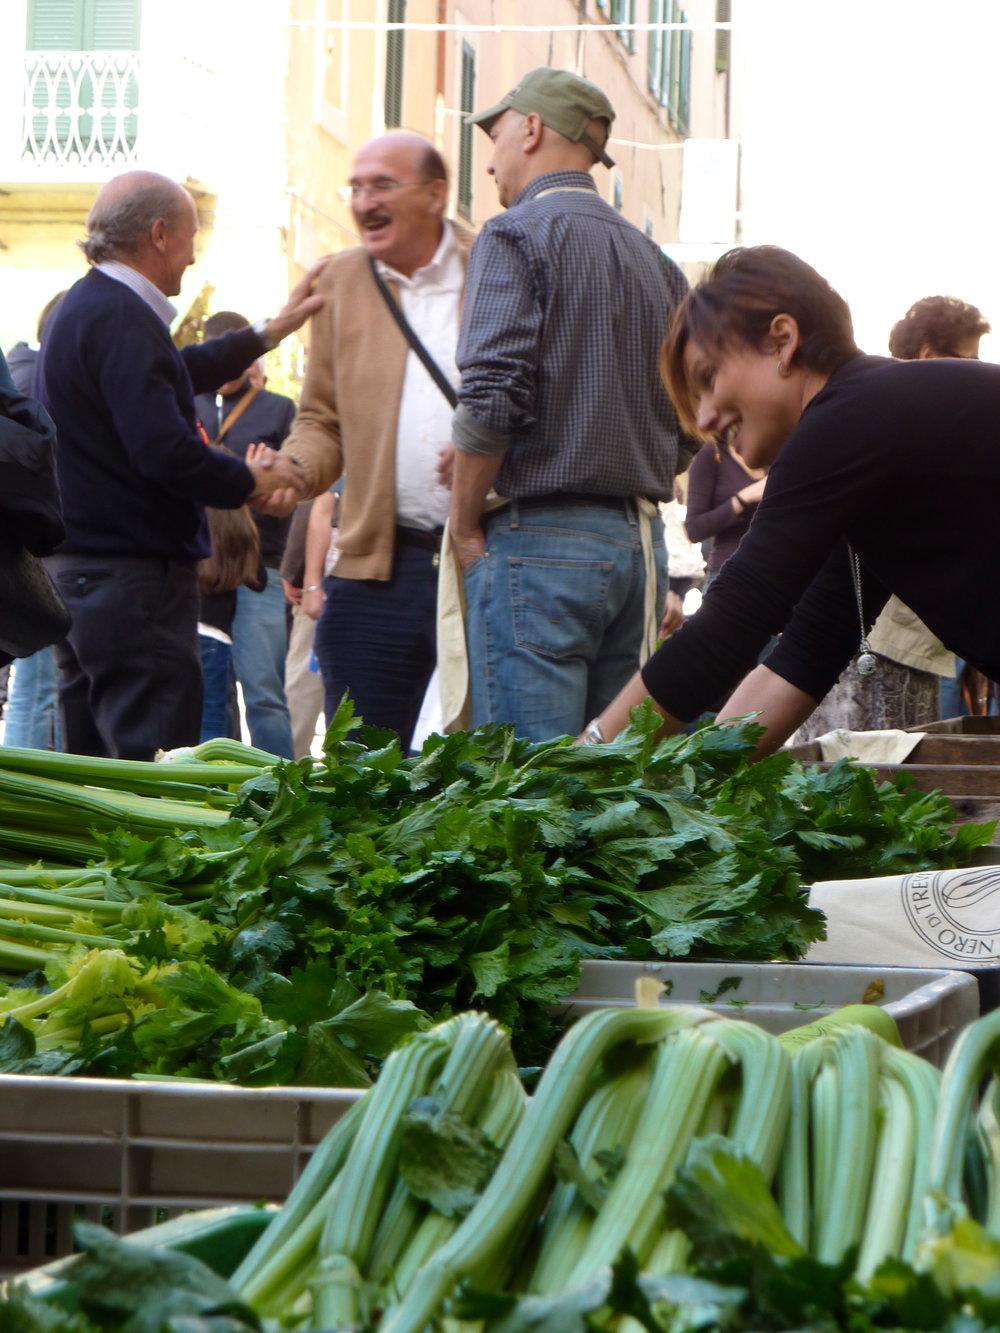 Sedano nero/black celery festival Trevi, Umbria